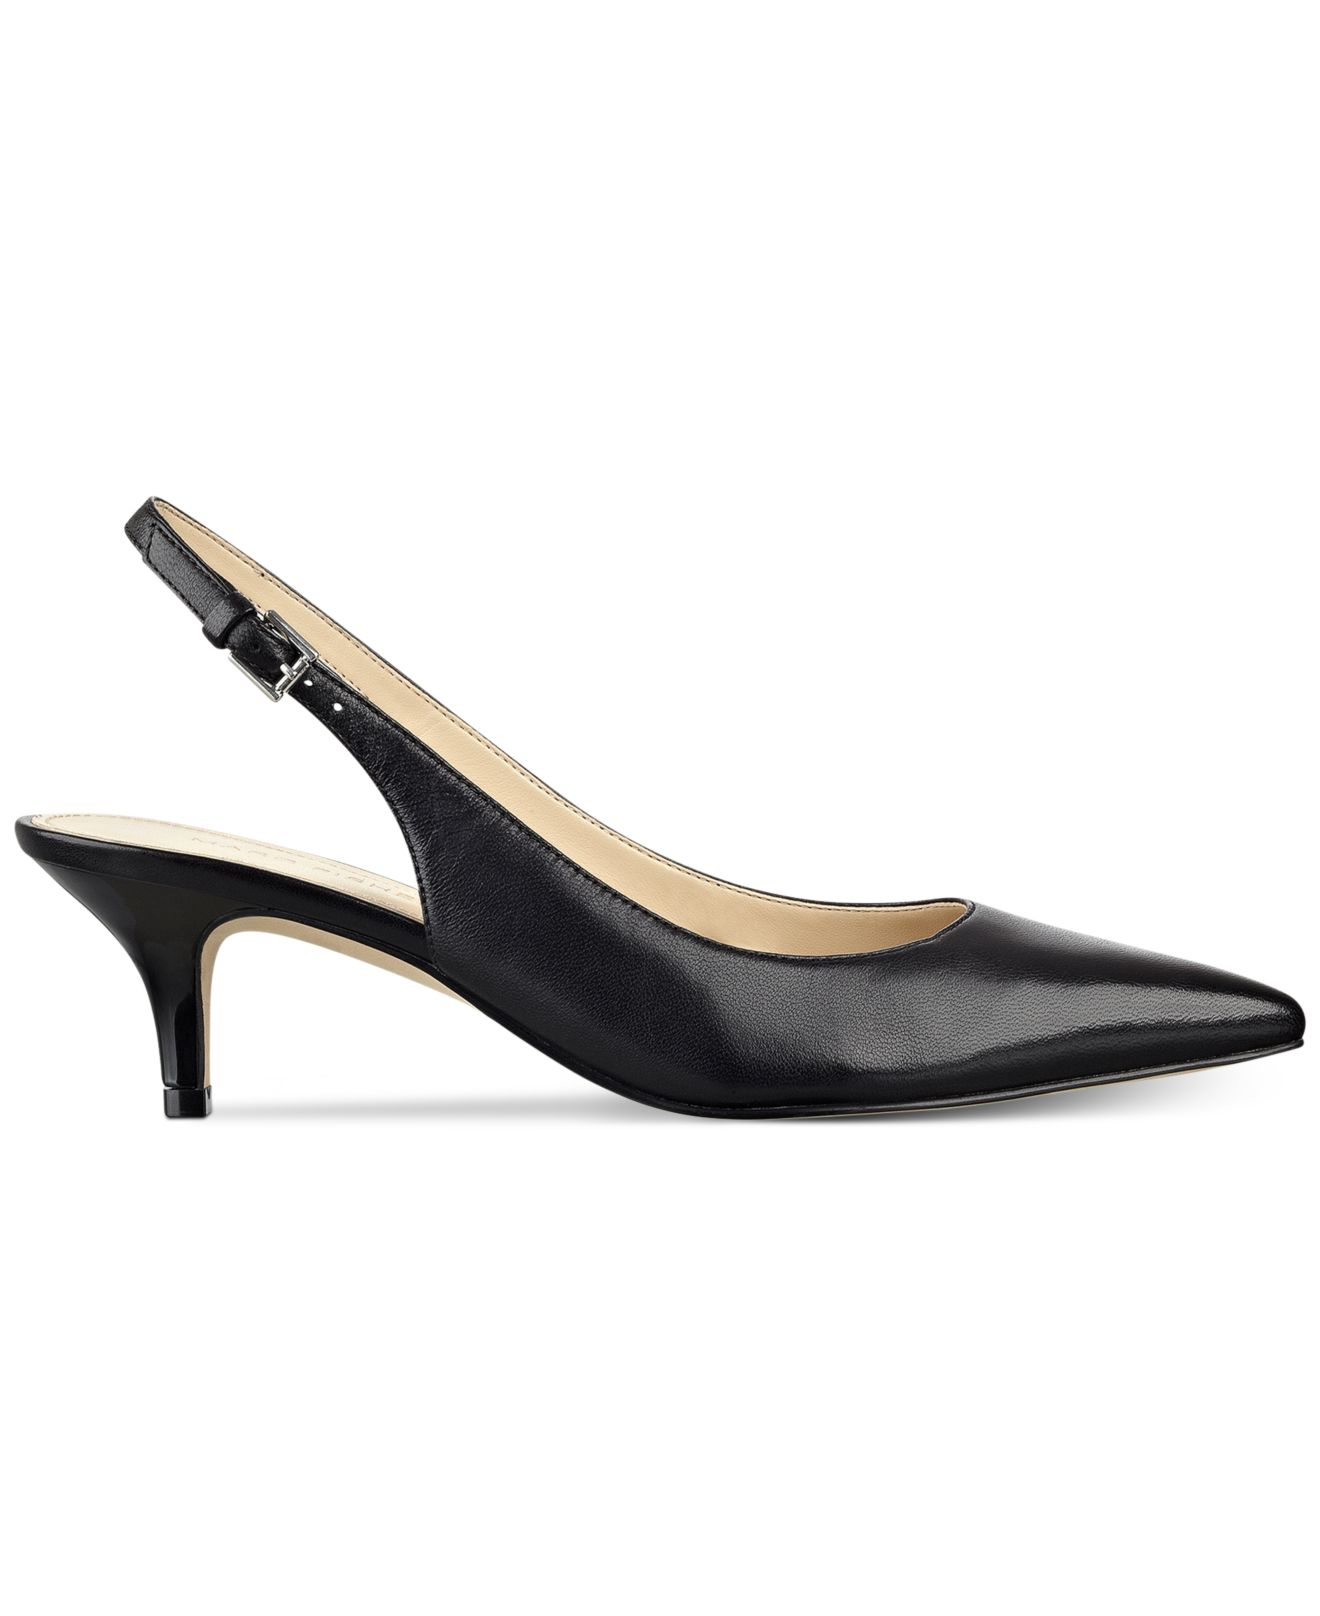 Black Patent Kitten Heel Slingback Shoes